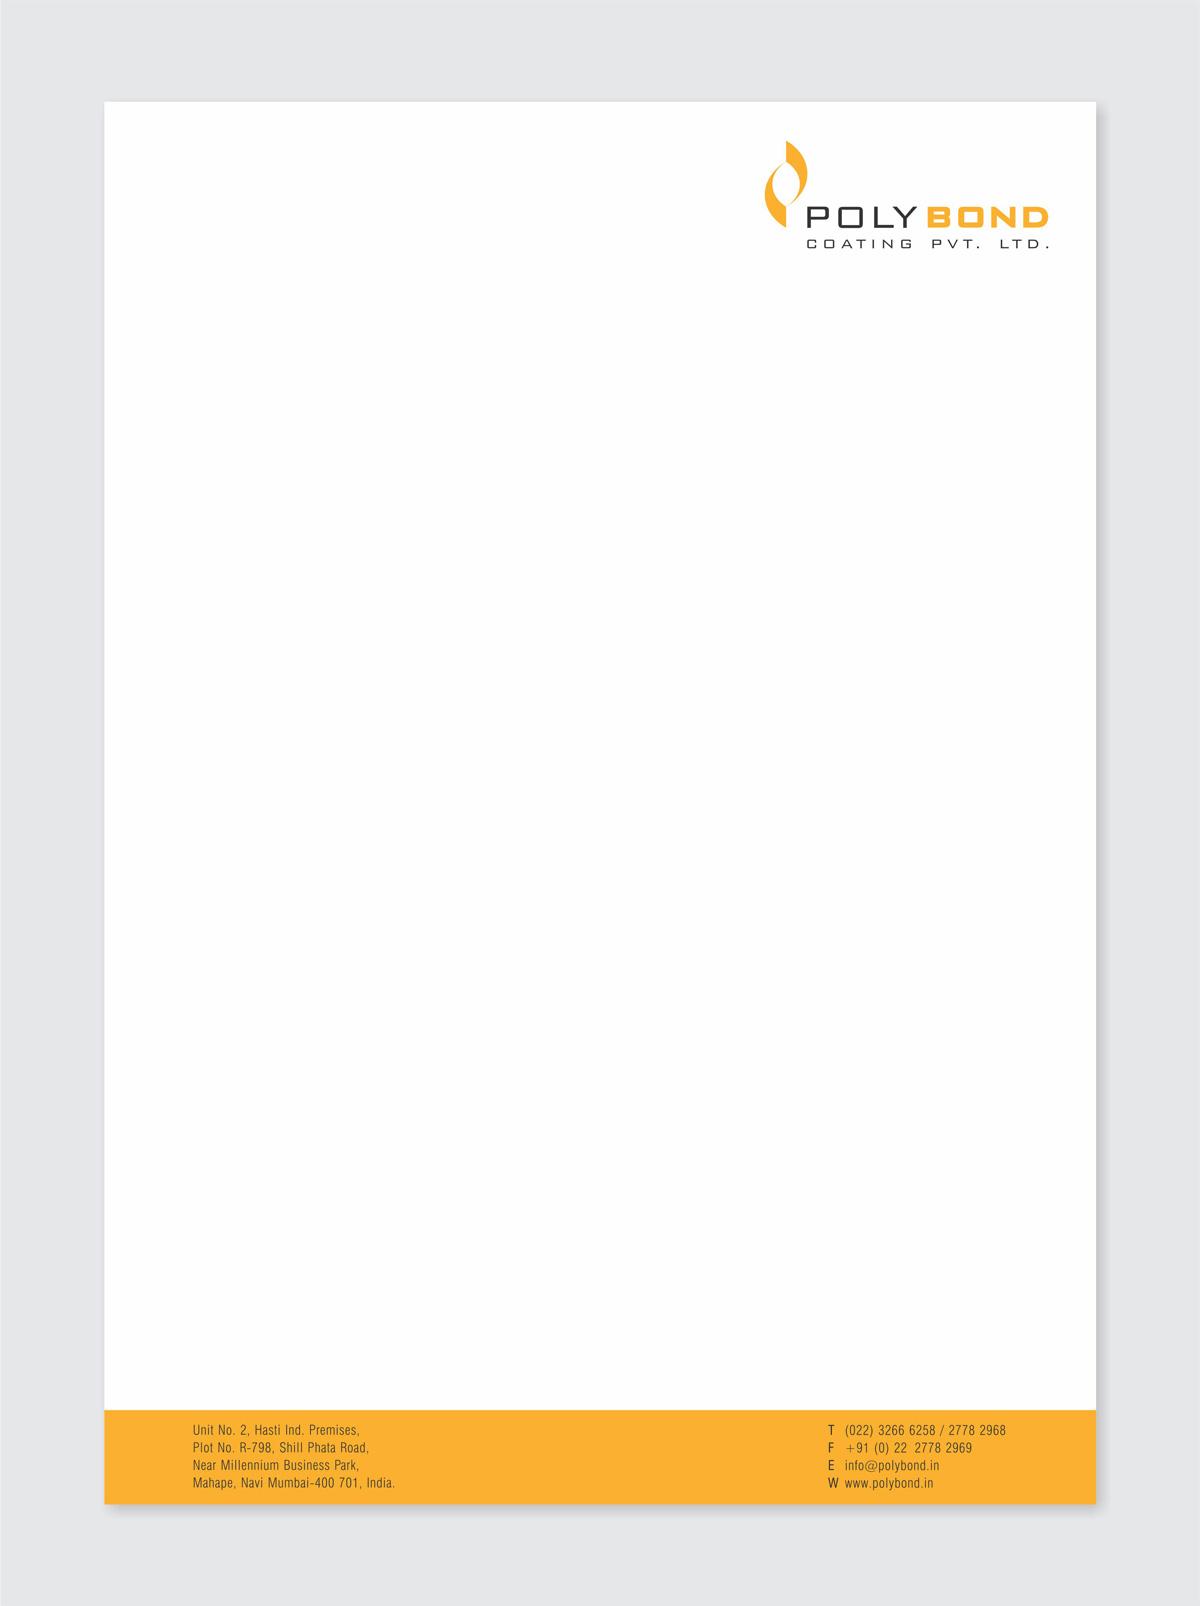 letter head design for mfr. of powder coating powders